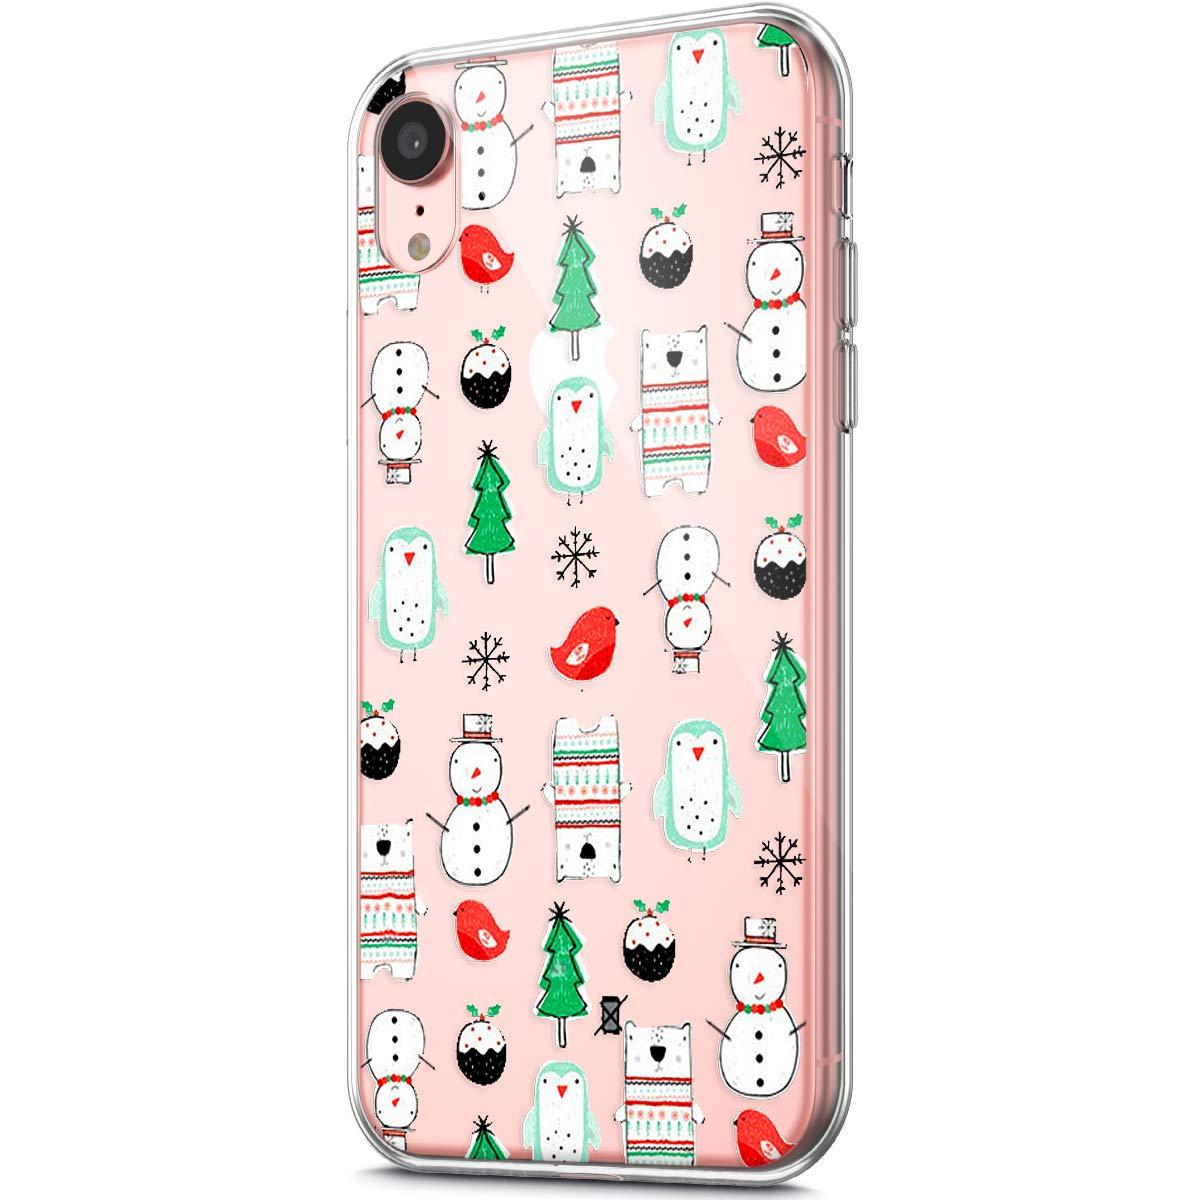 JAWSEU Funda iPhone XR, Transparente Fundas Carcasas Case Caso para iPhone XR, Flexible Ultra Suave TPU Navidad Cover Silicona Protecció n Delgada y Claridad para iPhone XR-#1 JBGMX001067X1